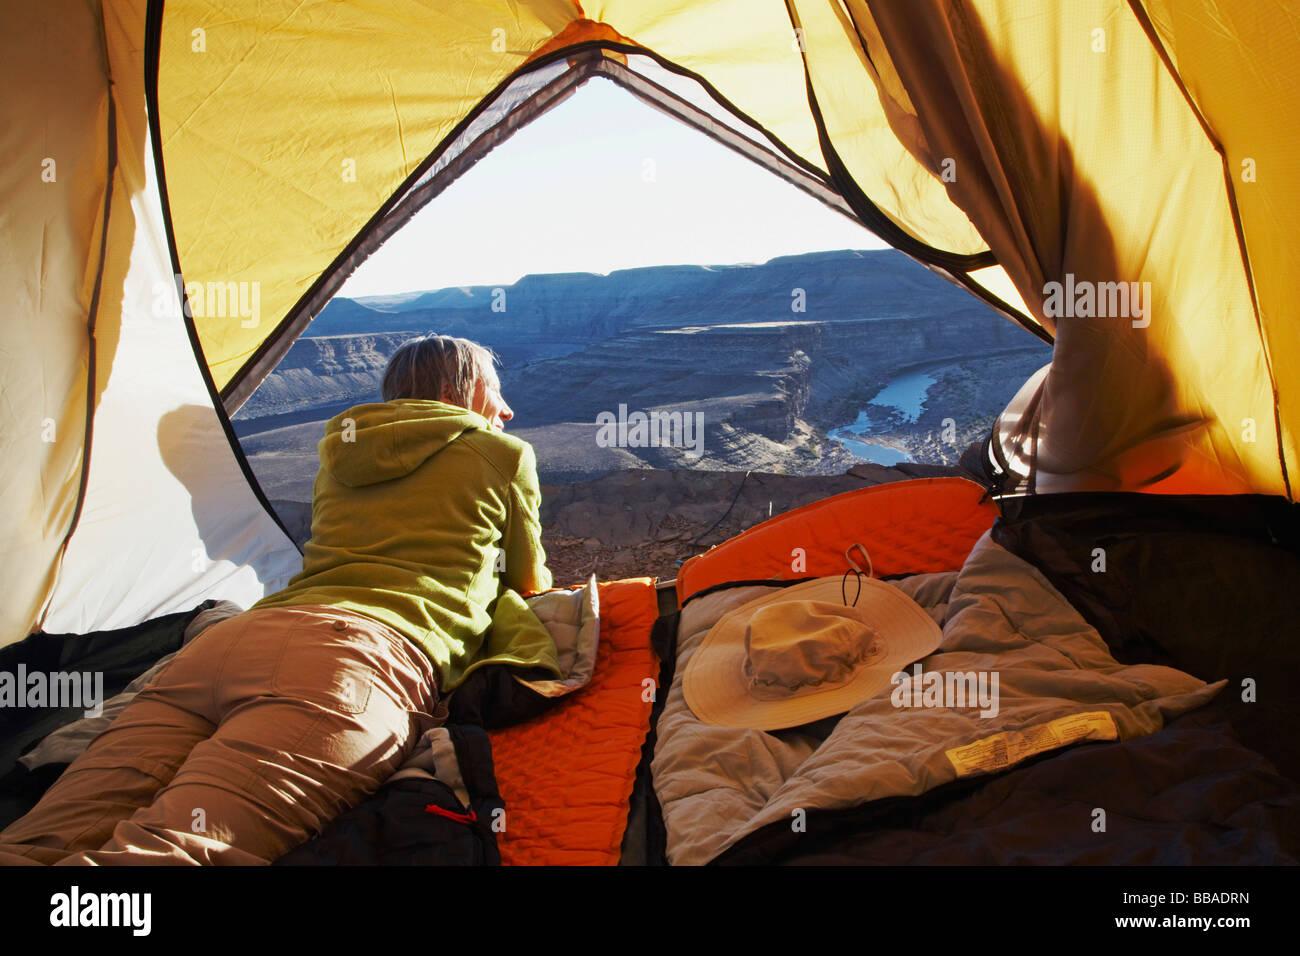 Eine Frau liegt in einem Zelt, Horse Shoe Bend, Fish River Canyon, Namibia Stockfoto